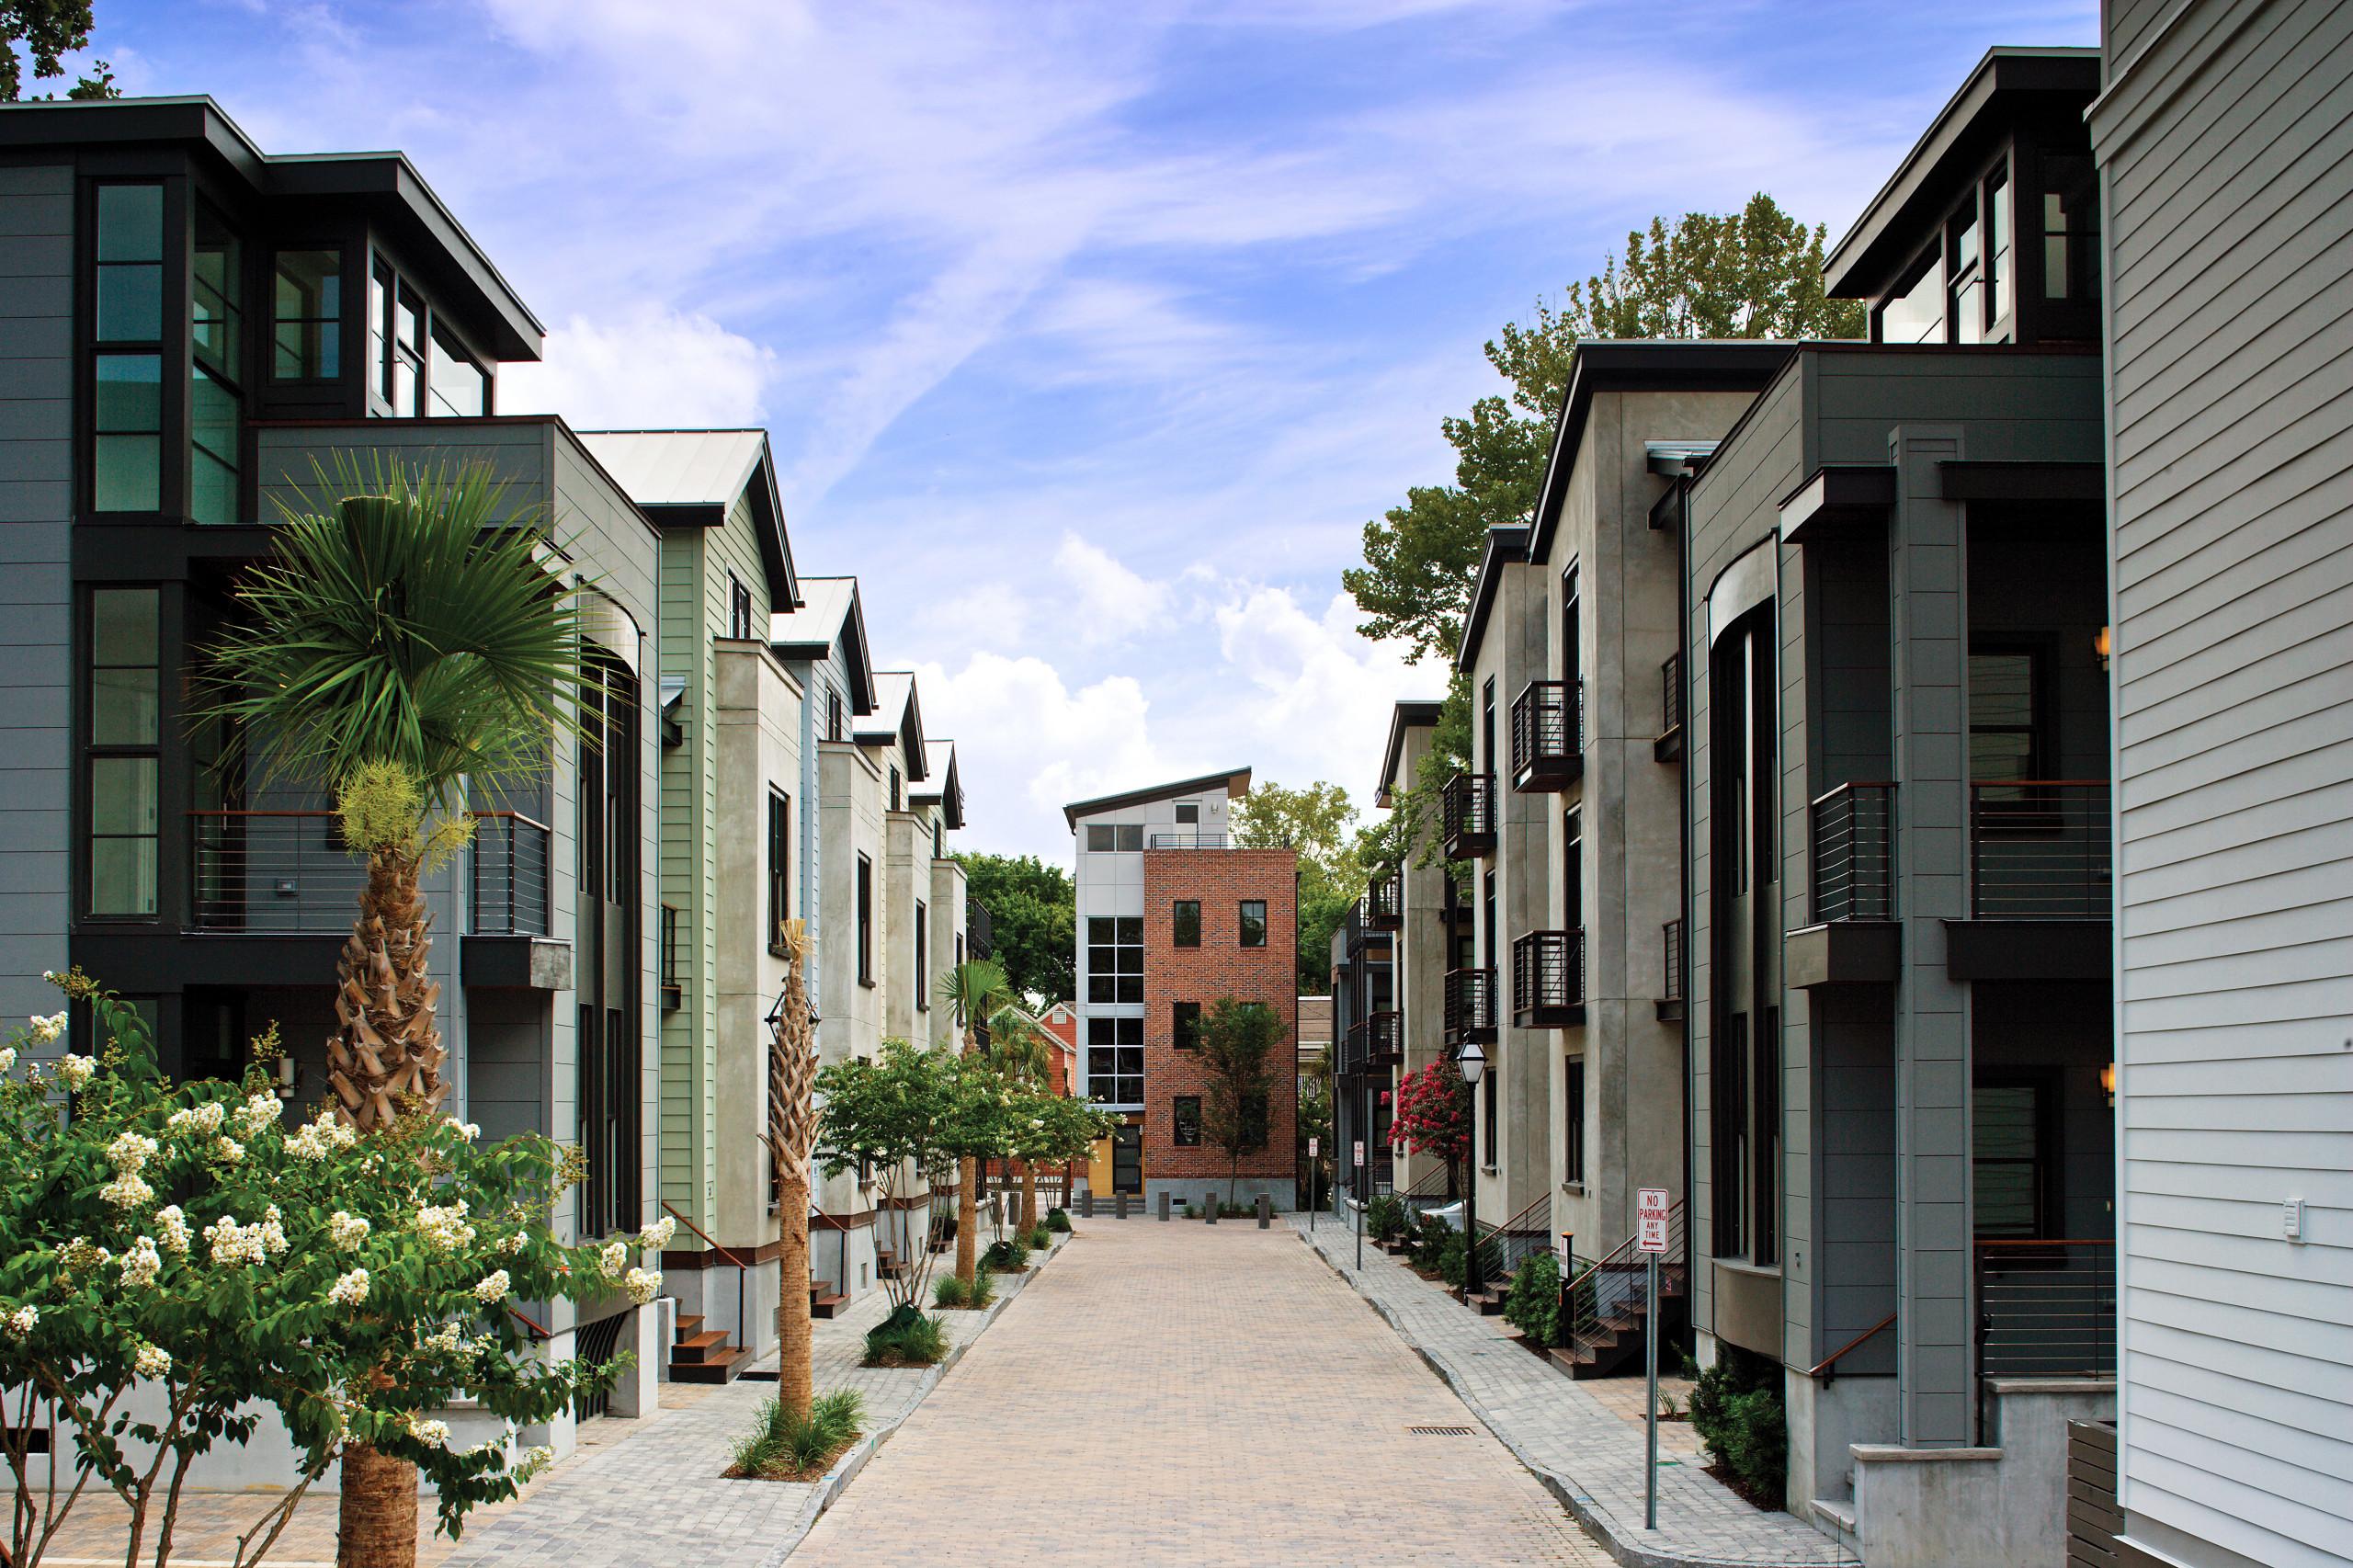 Midtown Contemporary Design in Historical Neighborhood